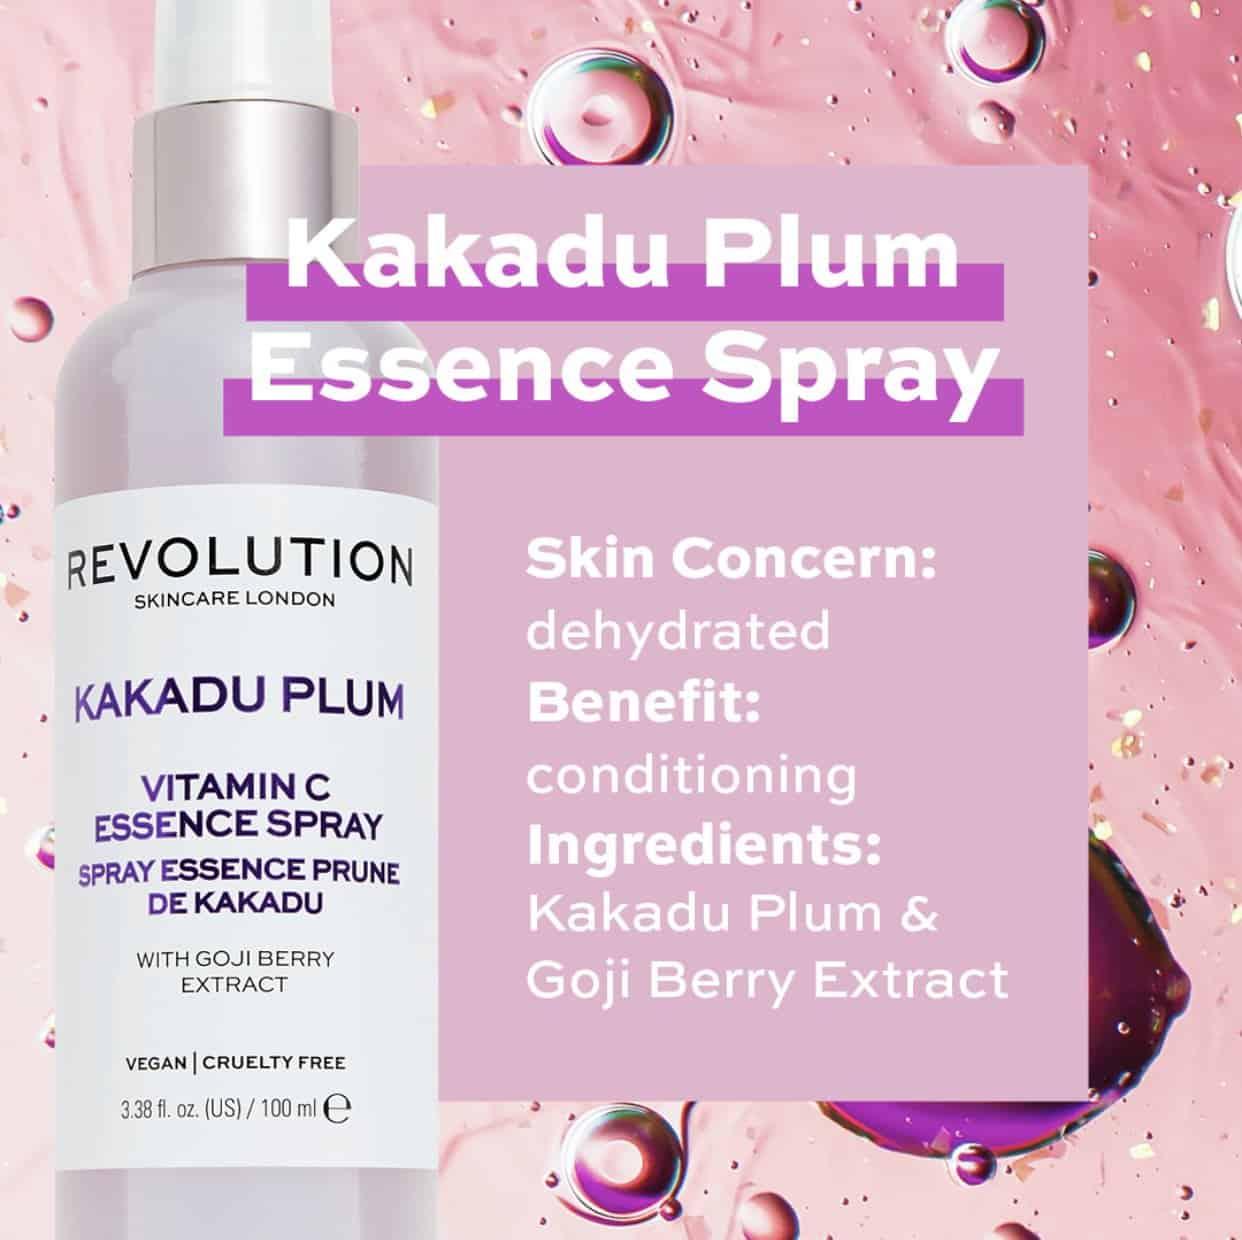 Revolution Skincare Kakadu Plum Vitamin C Essence Spray